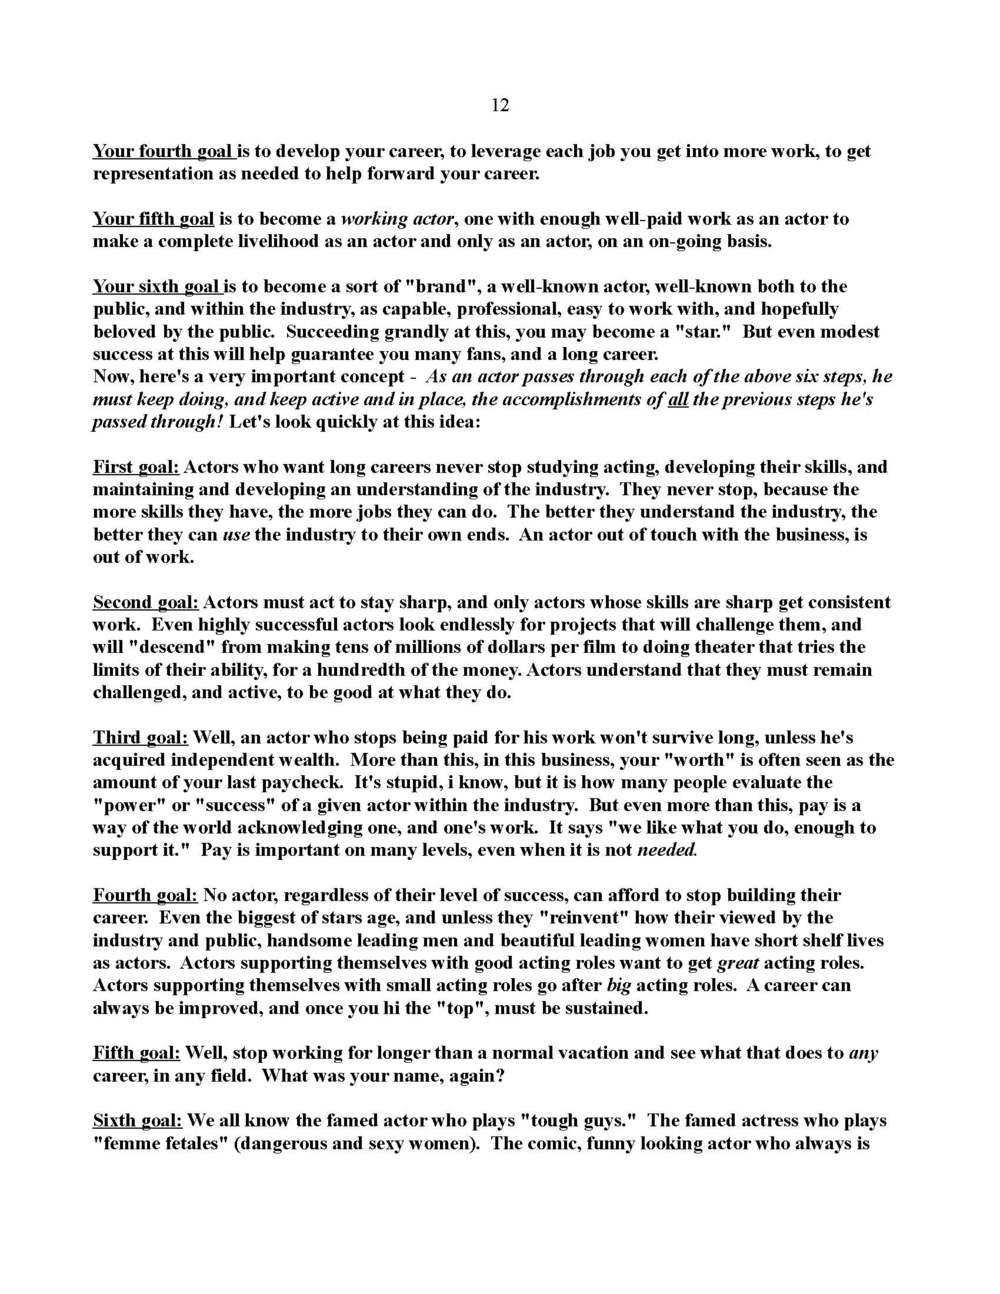 Binder1_Page_013.jpg